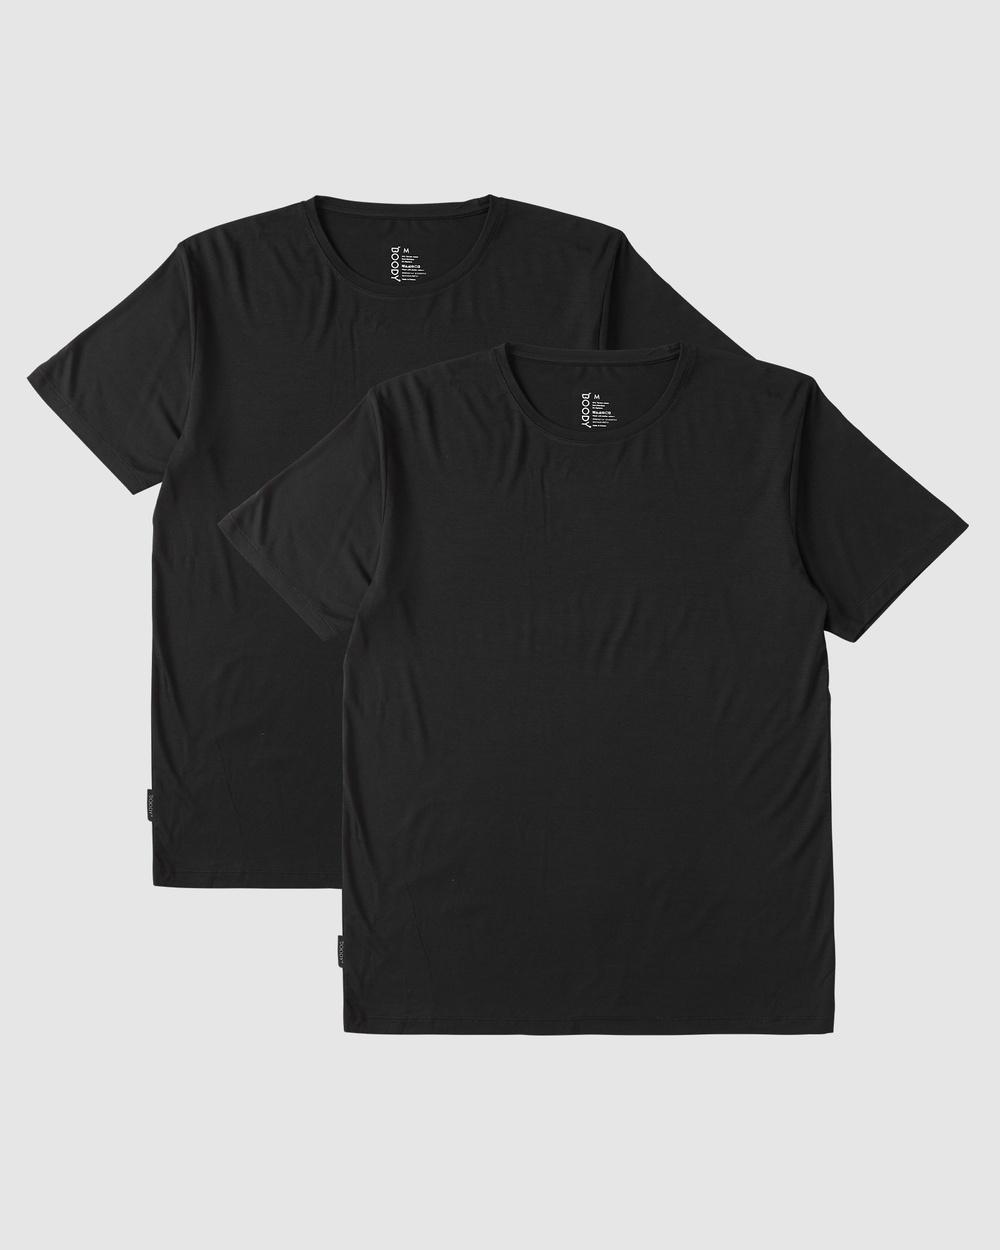 Boody Organic Bamboo Eco Wear - 2 Pack Crew Neck T Shirt - Short Sleeve T-Shirts (Black) 2 Pack Crew Neck T-Shirt